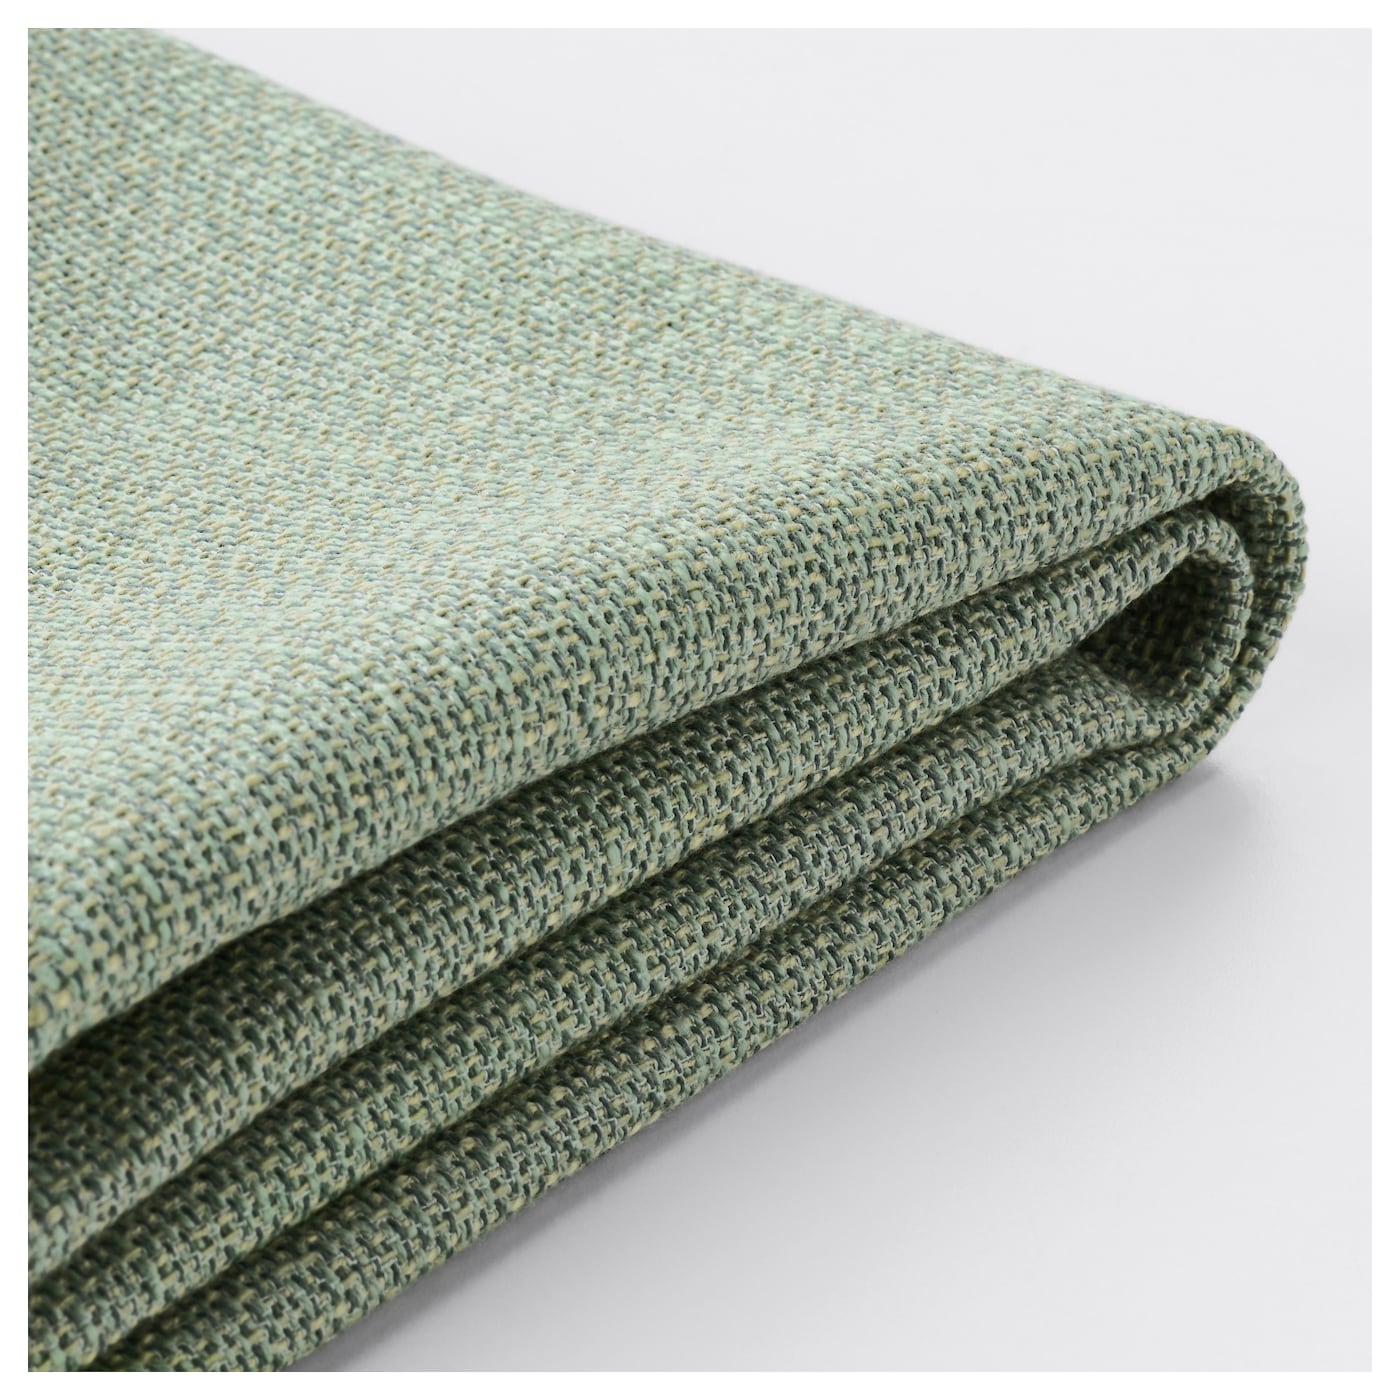 vallentuna housse pour dossier hillared vert 80x100 cm ikea. Black Bedroom Furniture Sets. Home Design Ideas